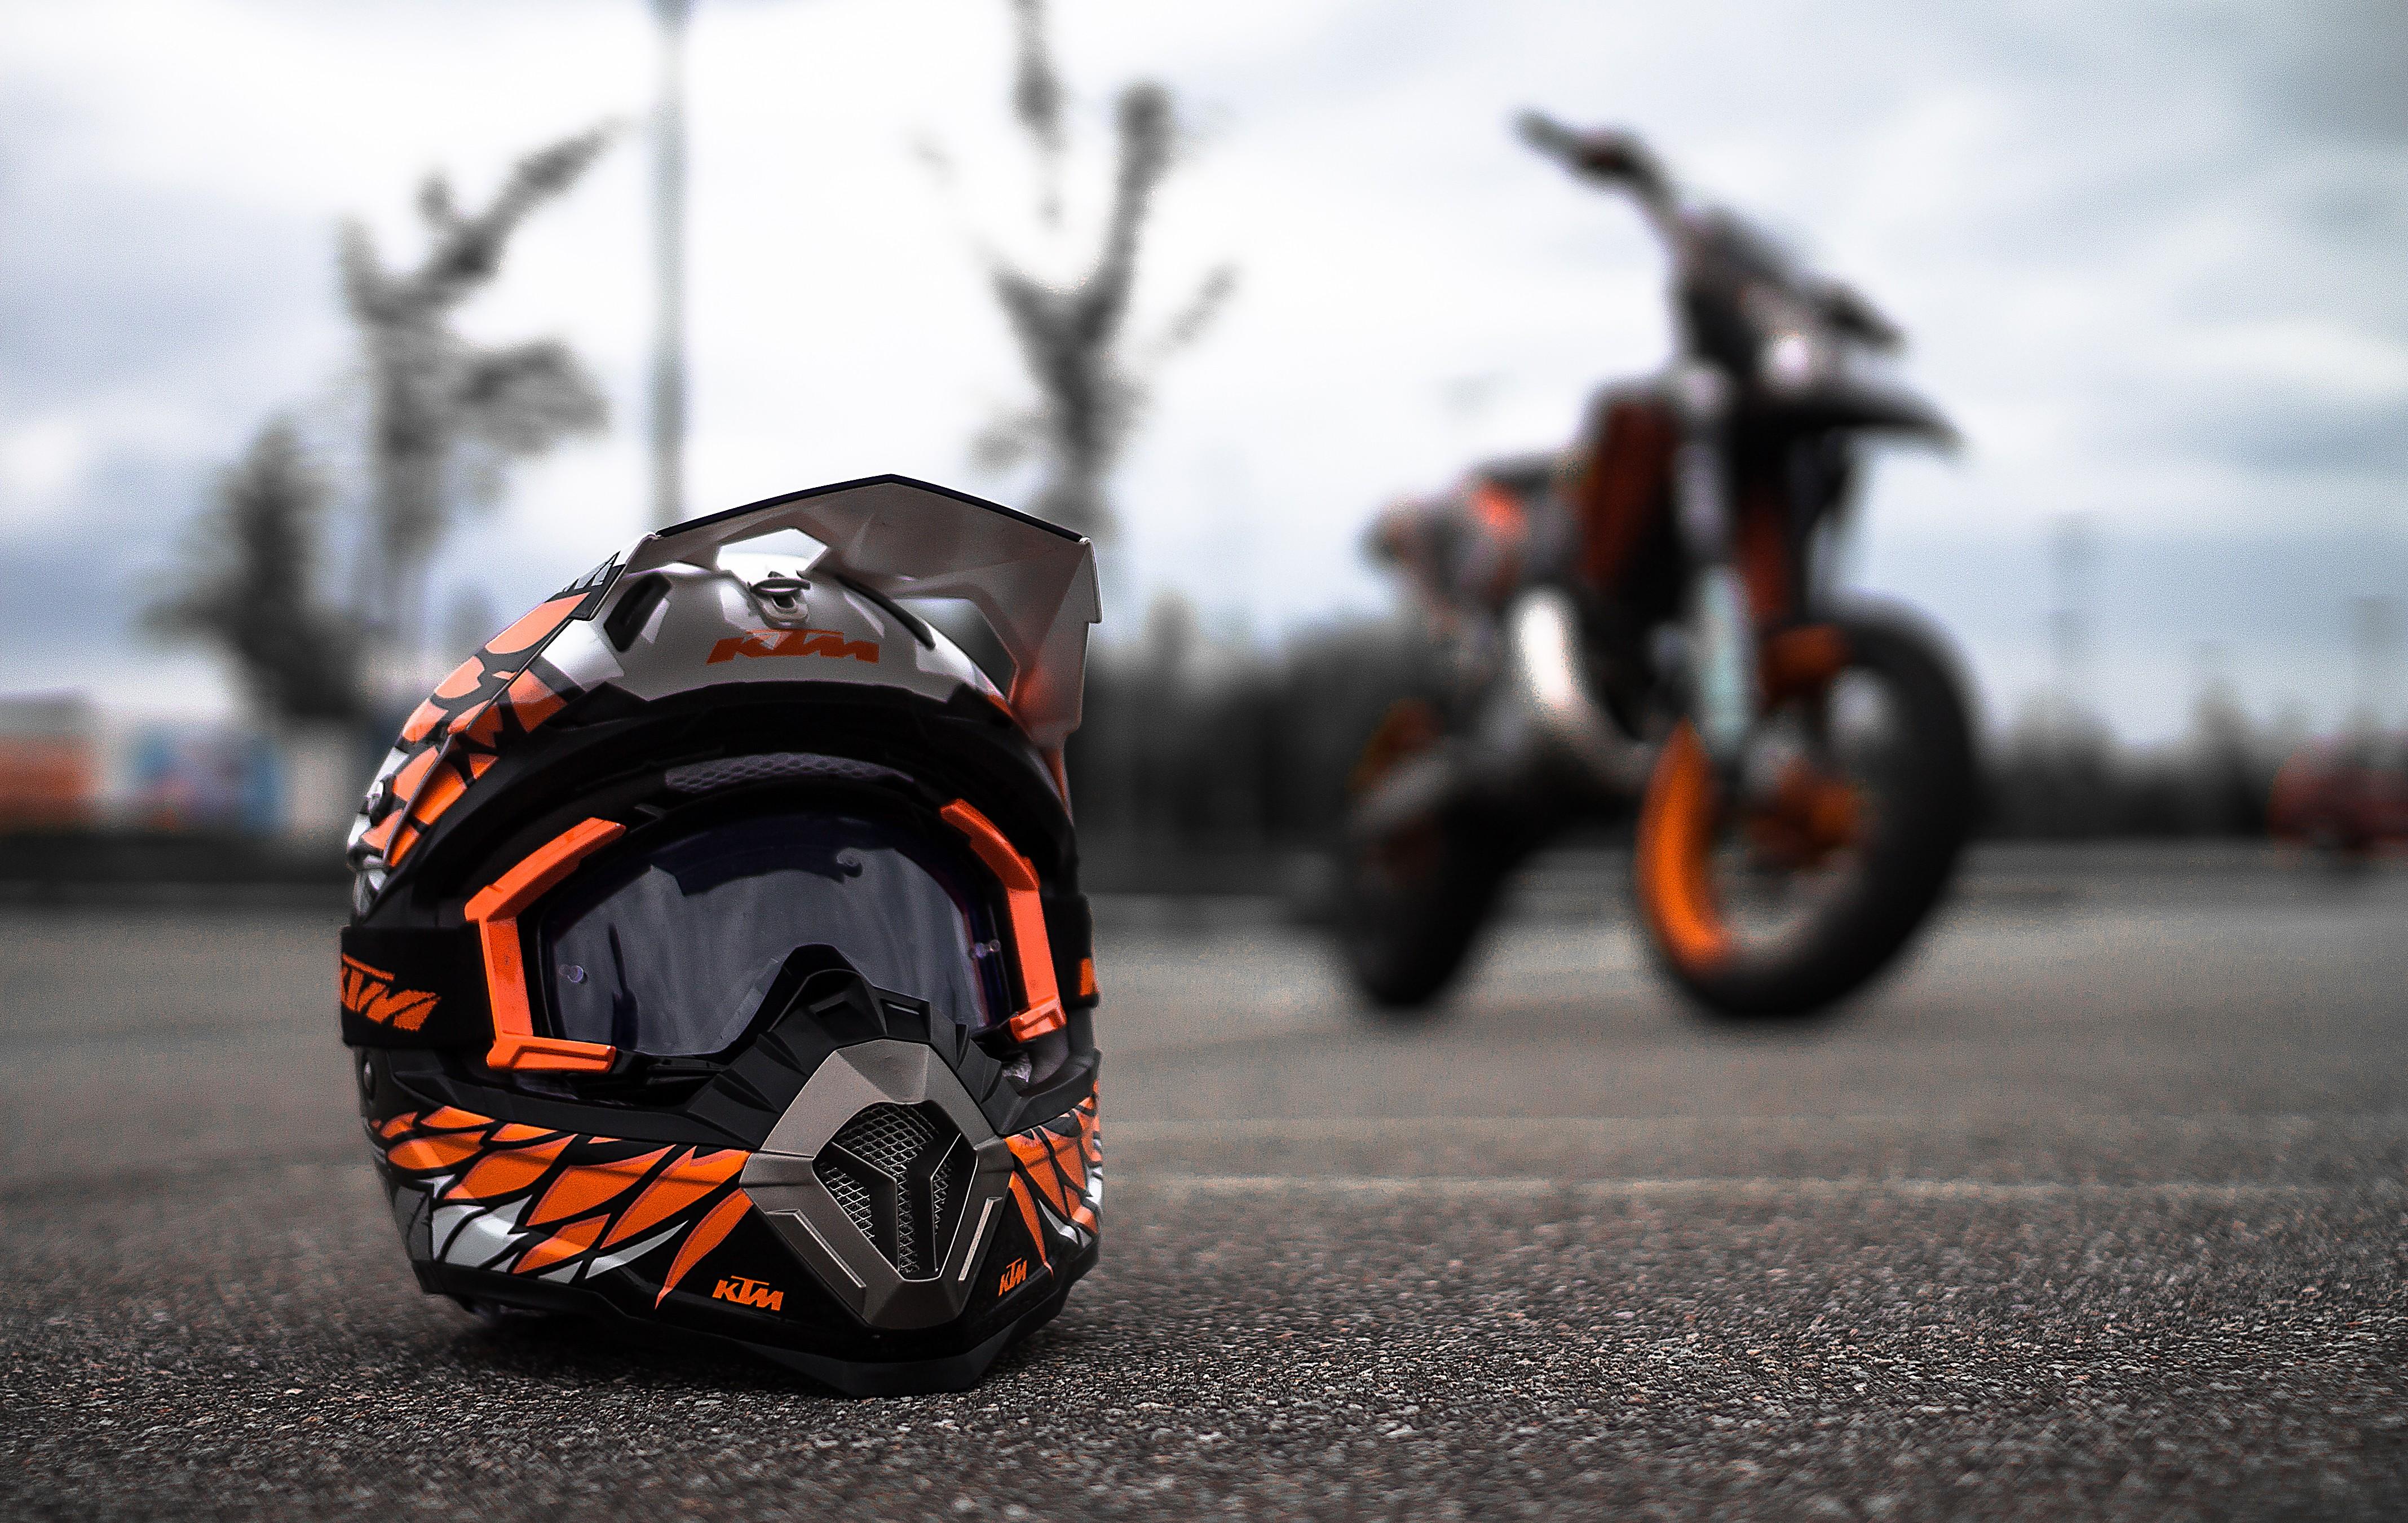 ktm helmet hd bikes 4k wallpapers images backgrounds